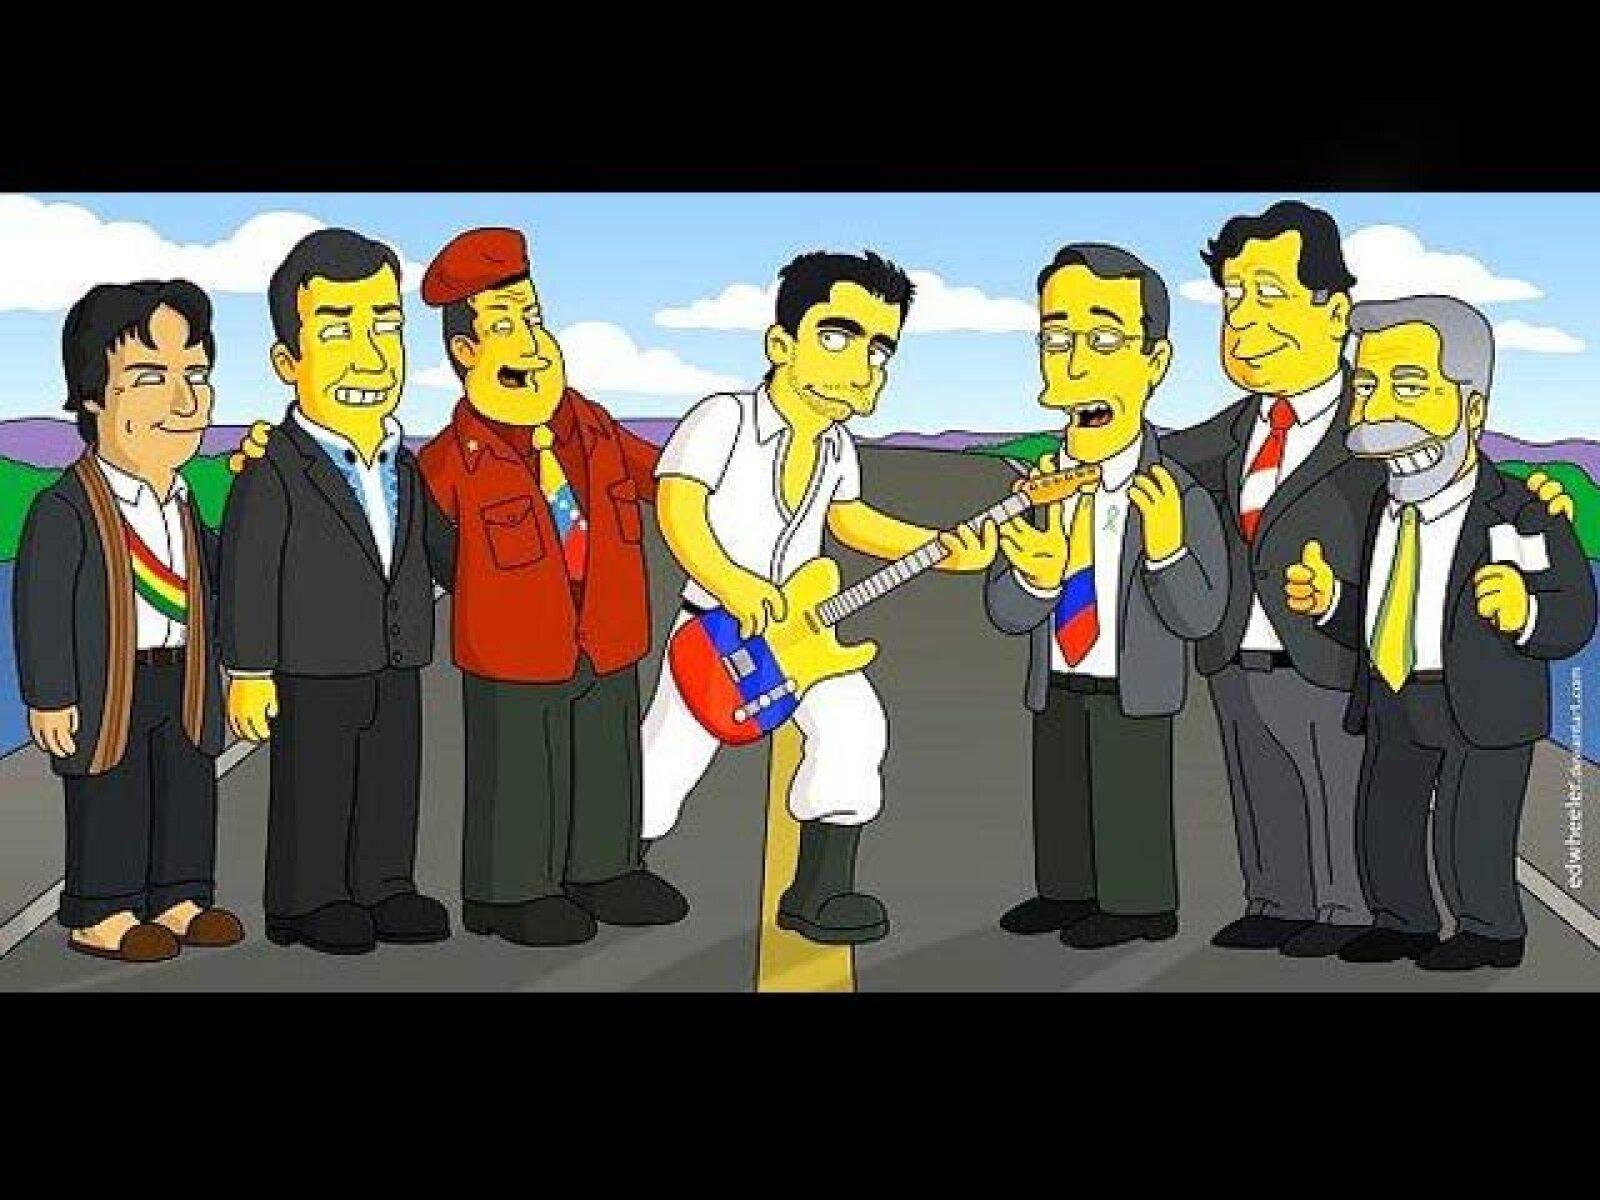 Evo Morales, Rafael Correa, Hugo Chávez, Álvaro Uribe, Alan García y Lula da Silva simpsoneados por Edwheeler